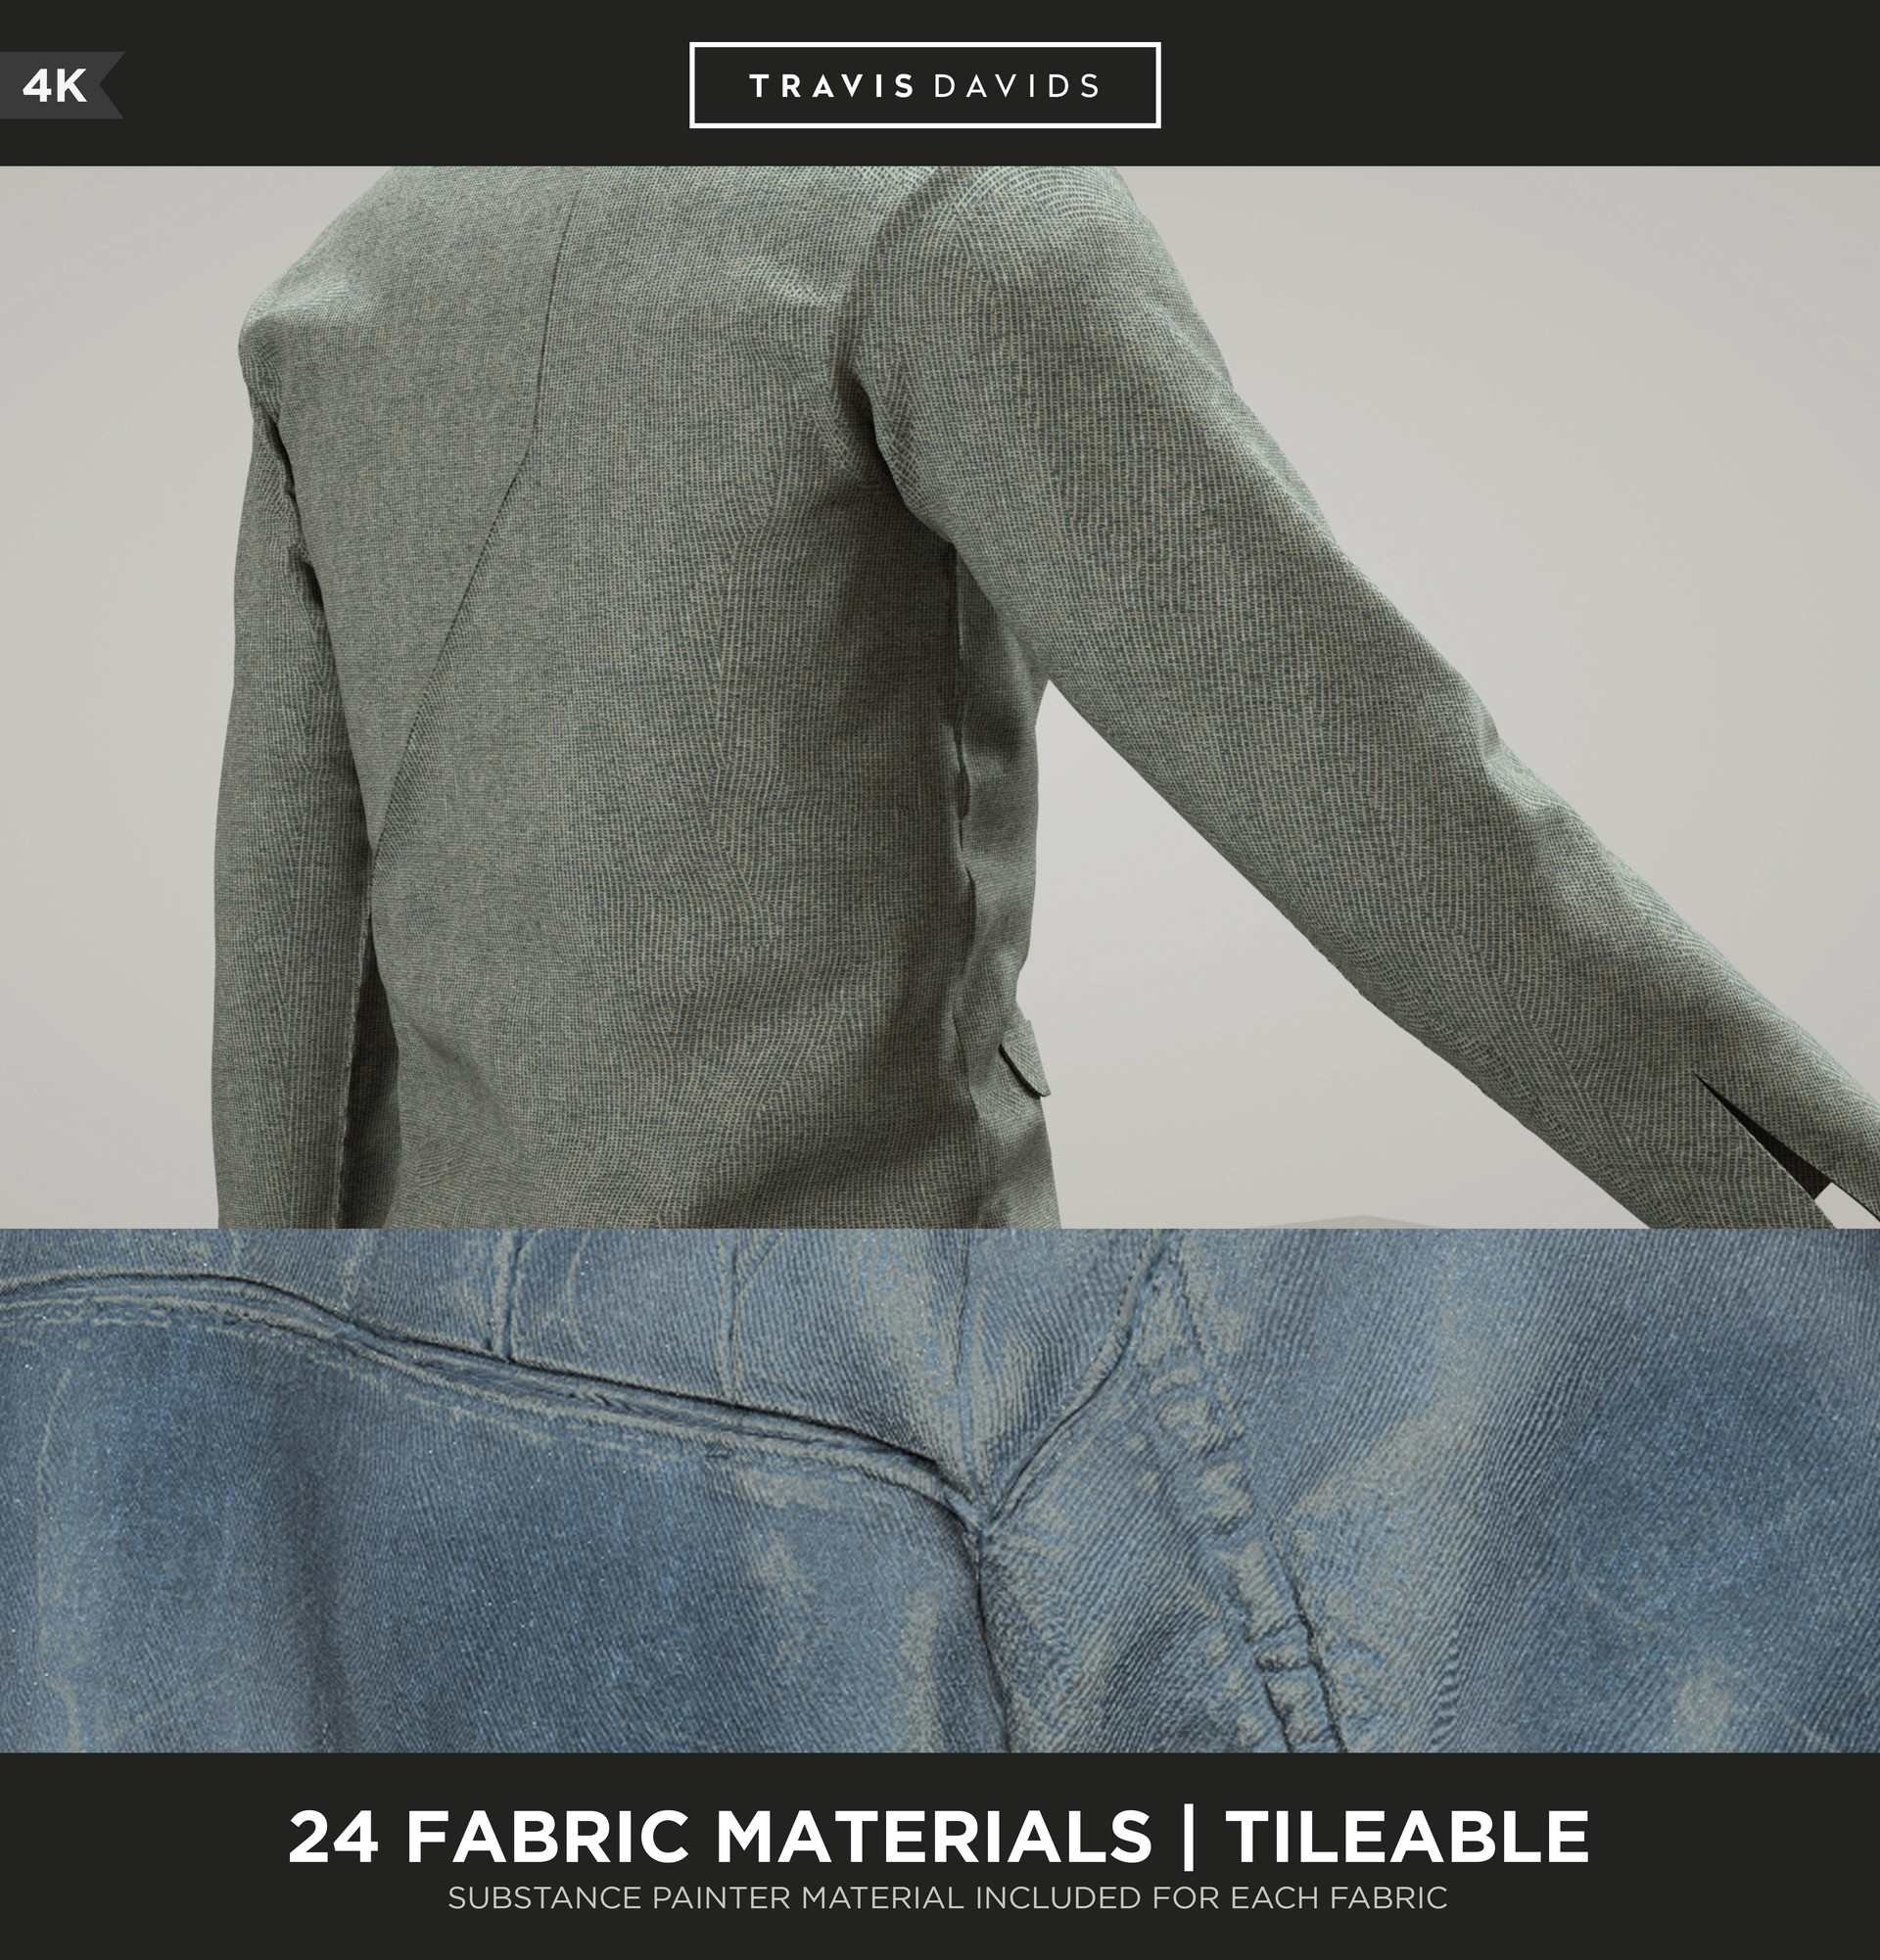 ArtStation - 24 FABRIC MATERIALS - 4K - TILEABLE - SUBSTANCE PAINTER